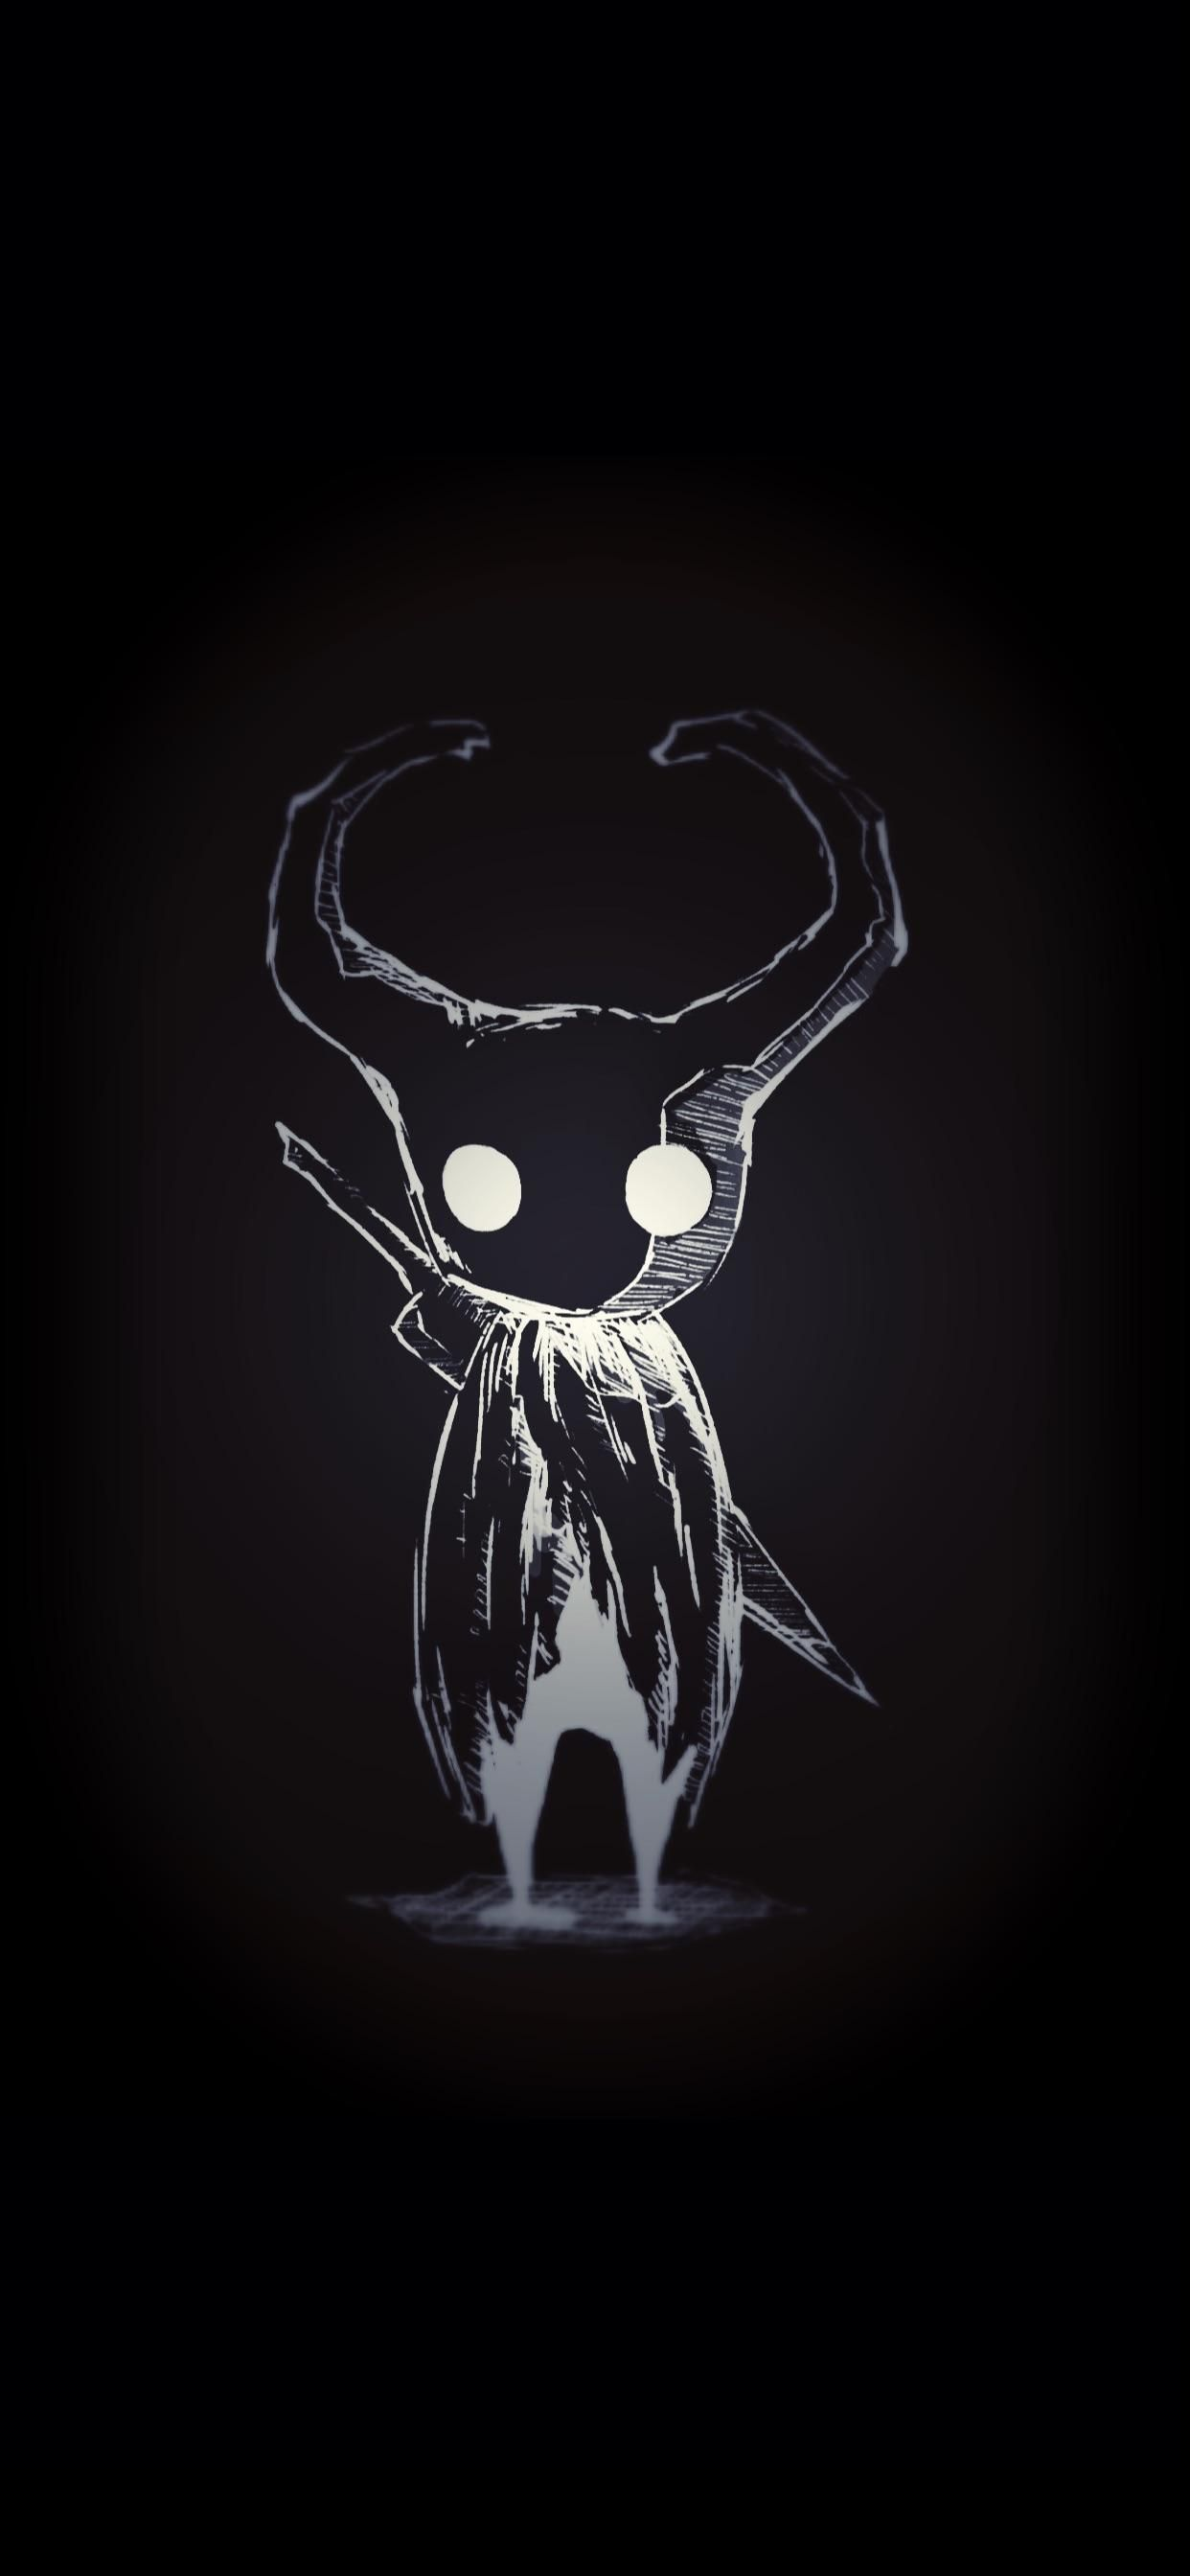 Iphone X Wallpaper Hollow Knight Hollow Art Knight Art Knight